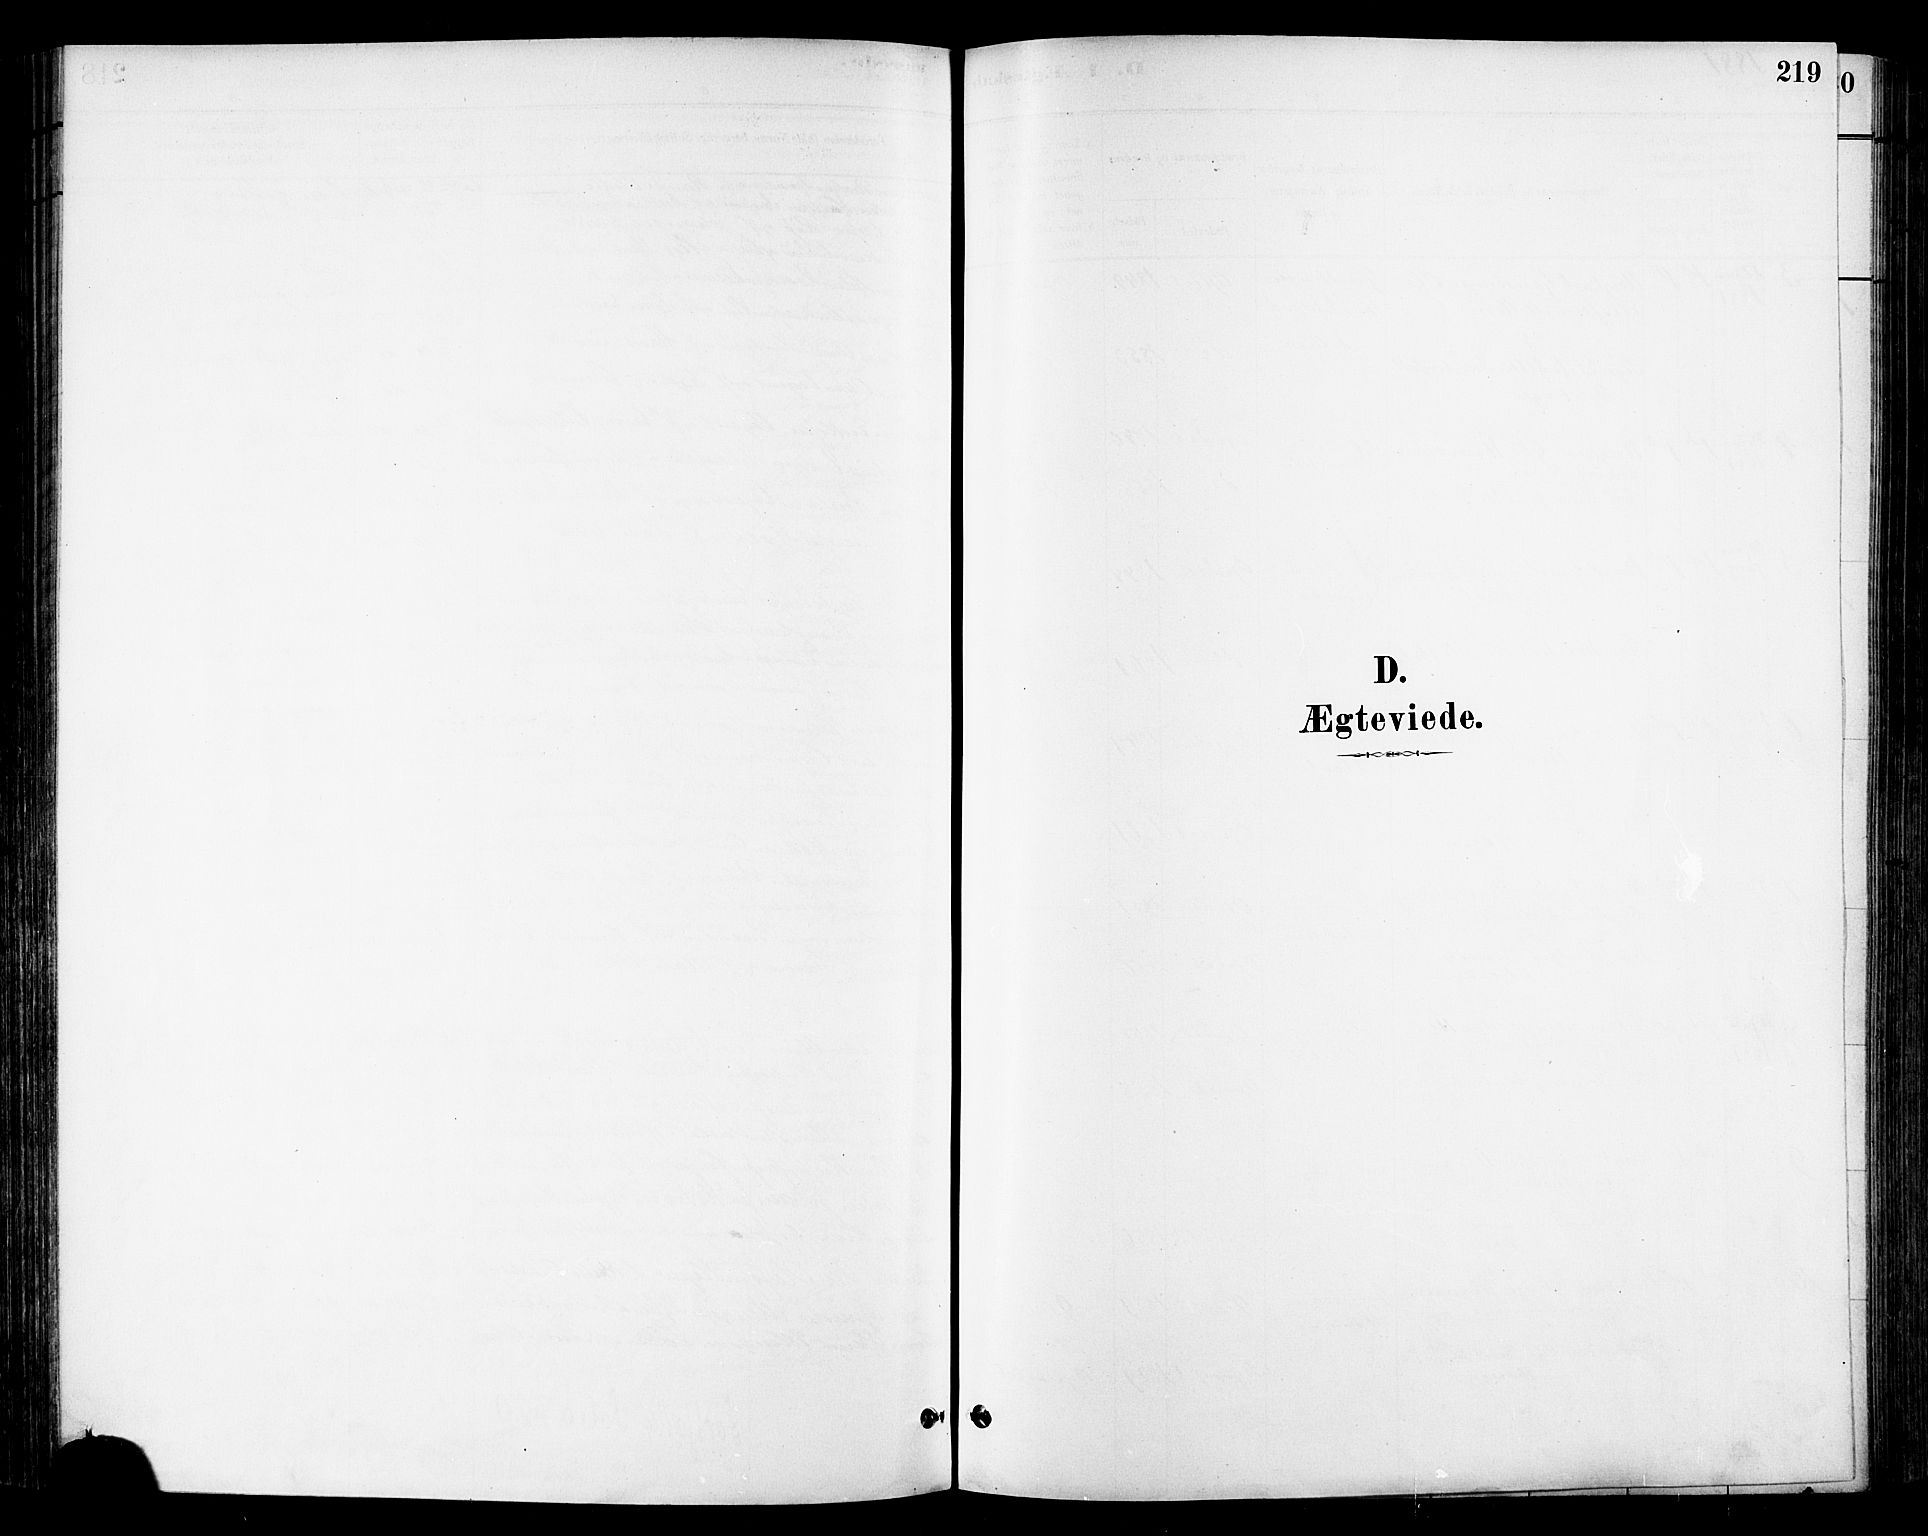 SAT, Ministerialprotokoller, klokkerbøker og fødselsregistre - Sør-Trøndelag, 678/L0901: Parish register (official) no. 678A10, 1881-1894, p. 219